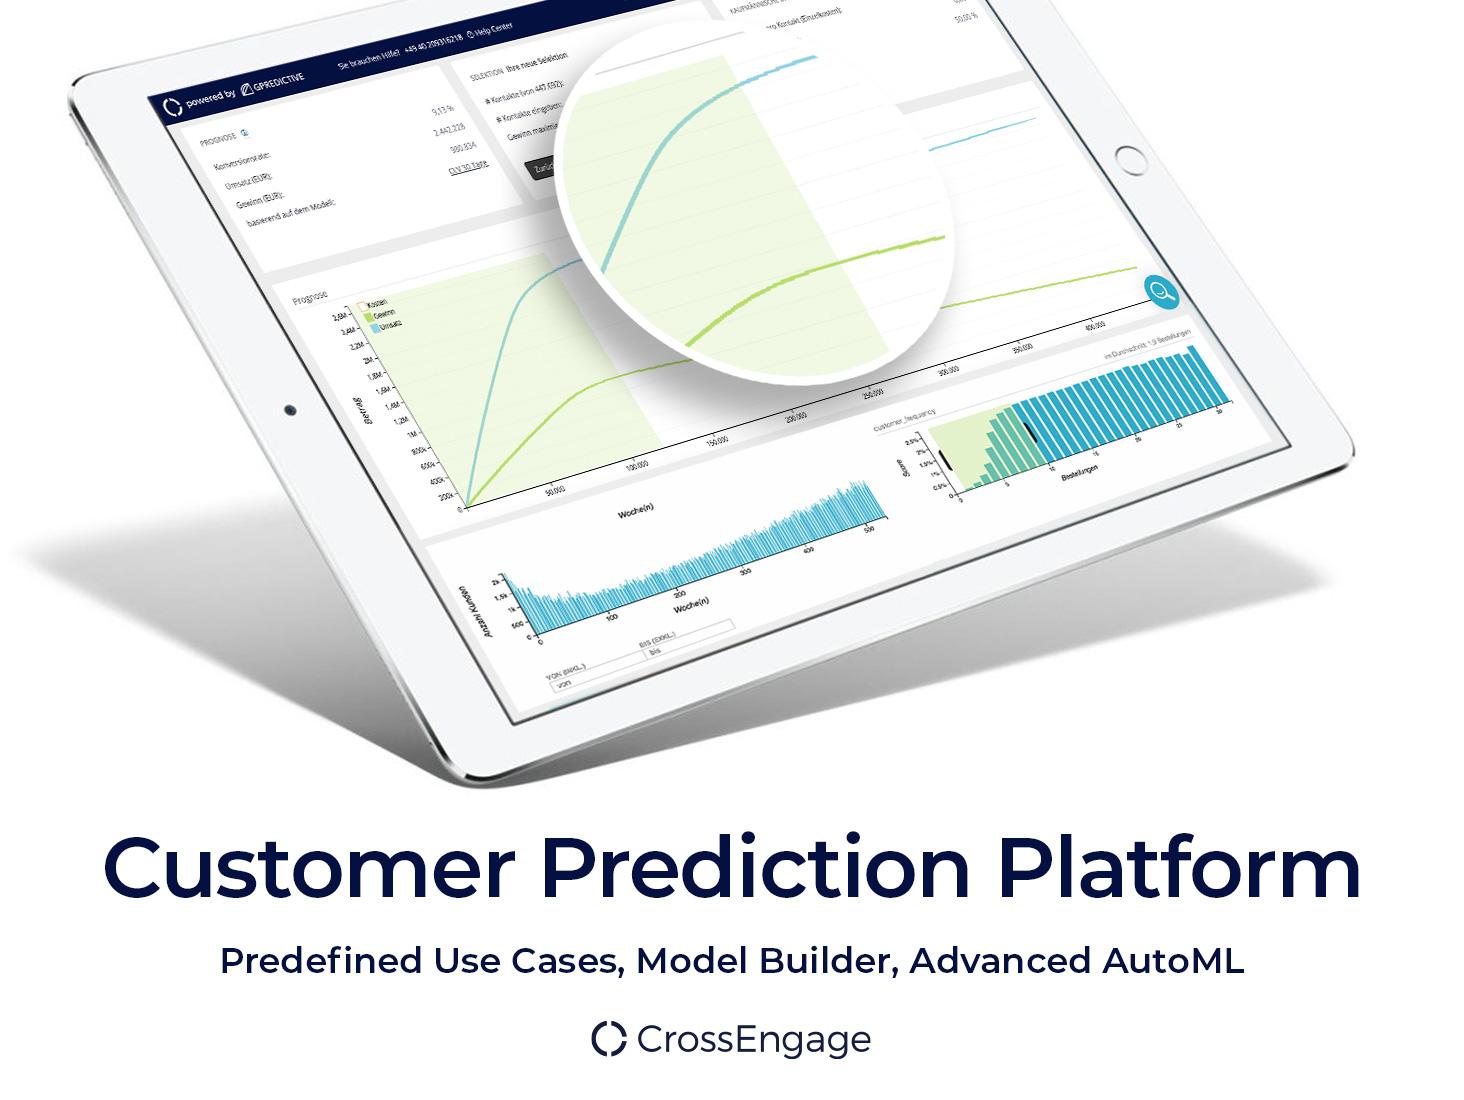 Customer Prediction Platform